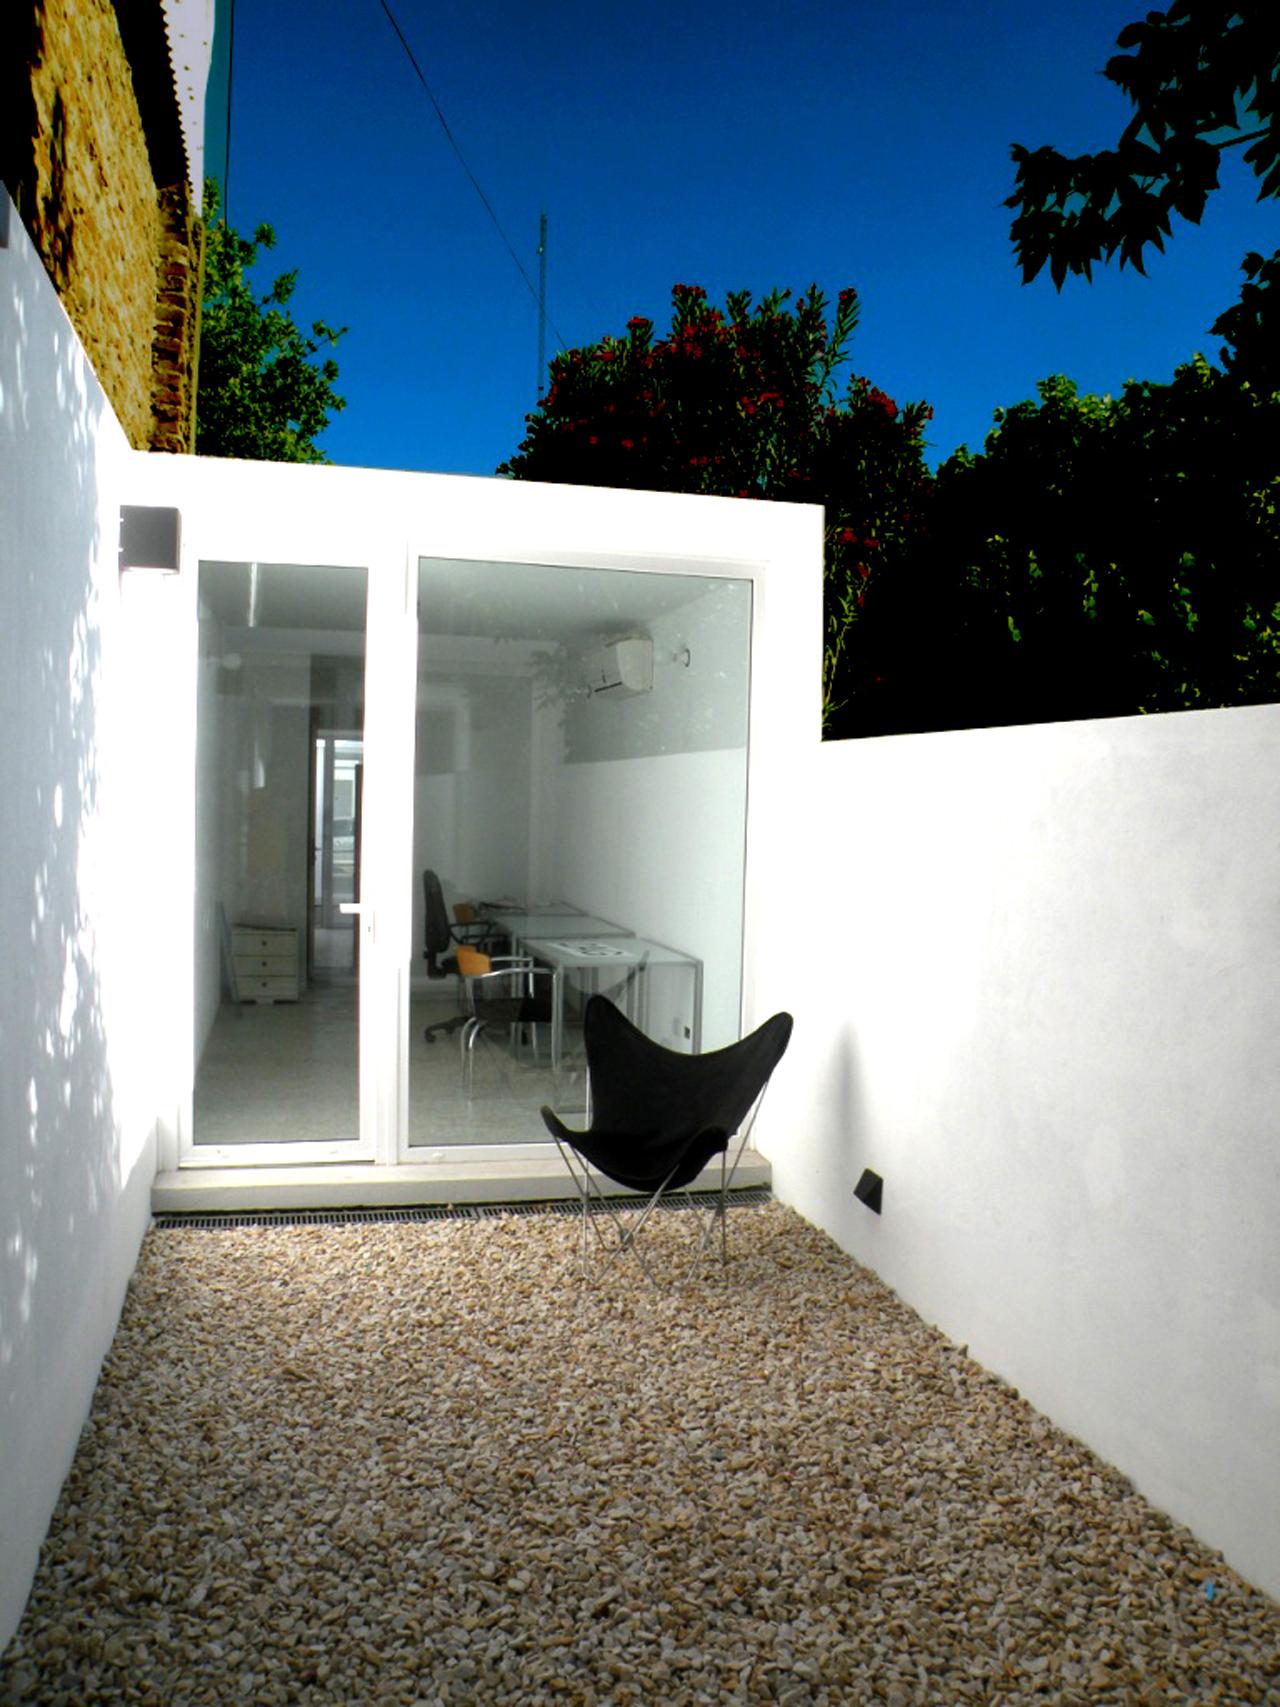 Galeria de estudio de p tios estudio 2ag arquitectos 3 - Estudio 3 arquitectos ...